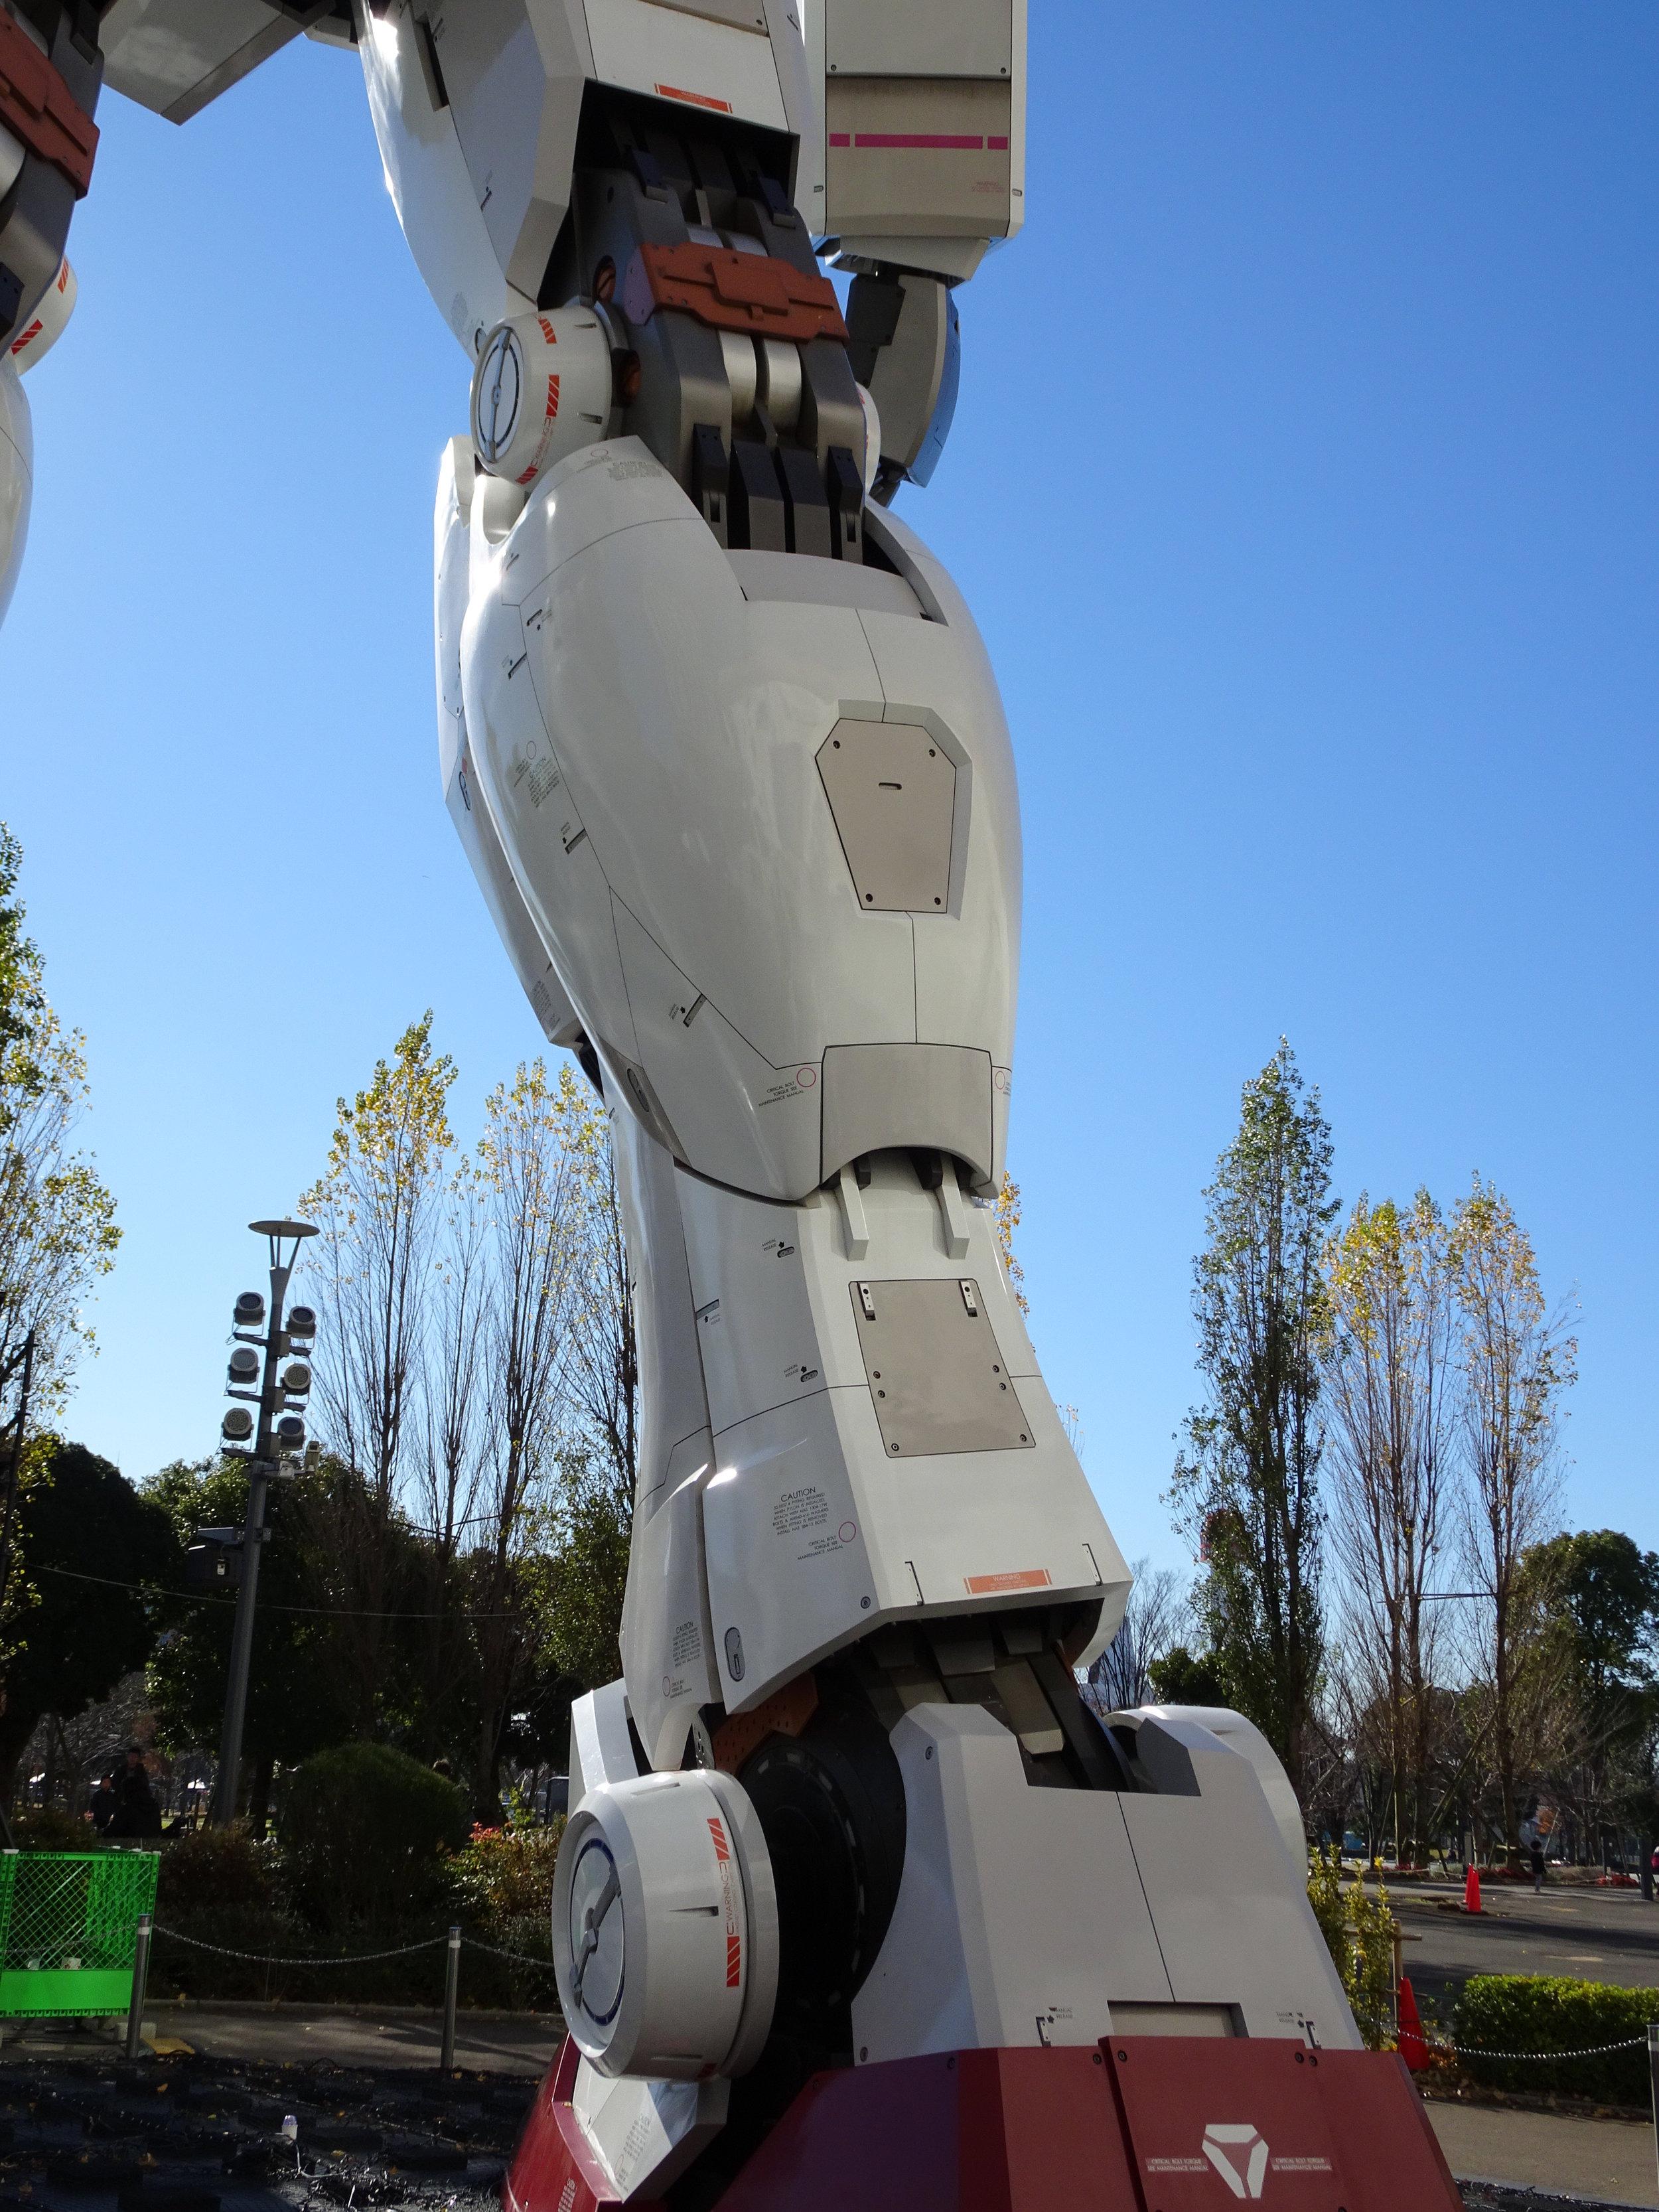 RX-78-2 Gundam 1-1 Statue - 061.jpg